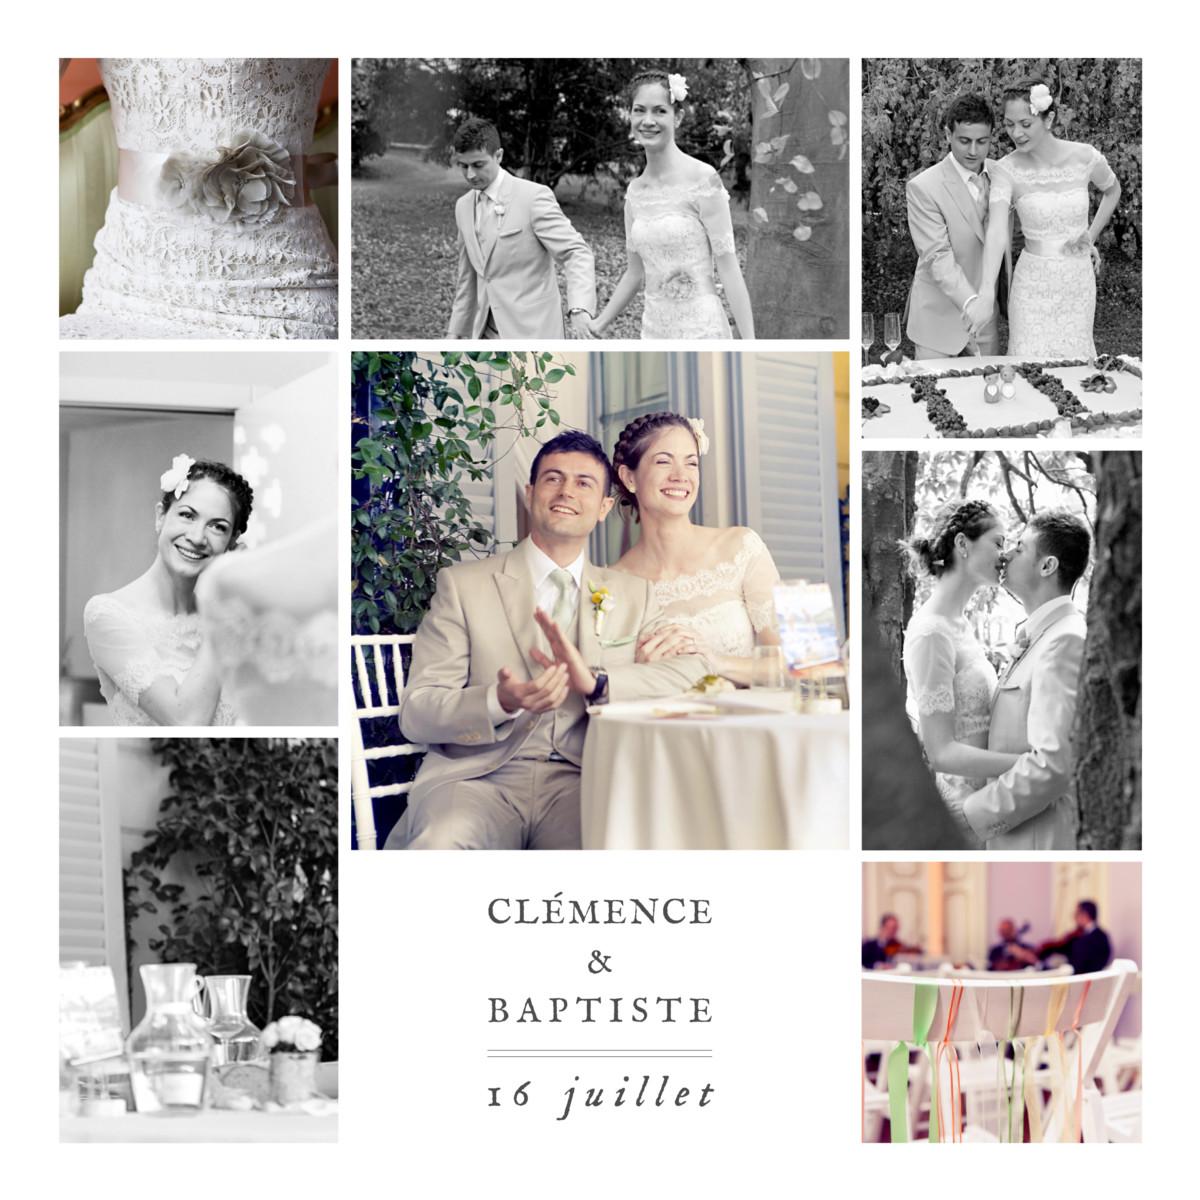 carte de remerciement mariage grand souvenir 8 photos. Black Bedroom Furniture Sets. Home Design Ideas